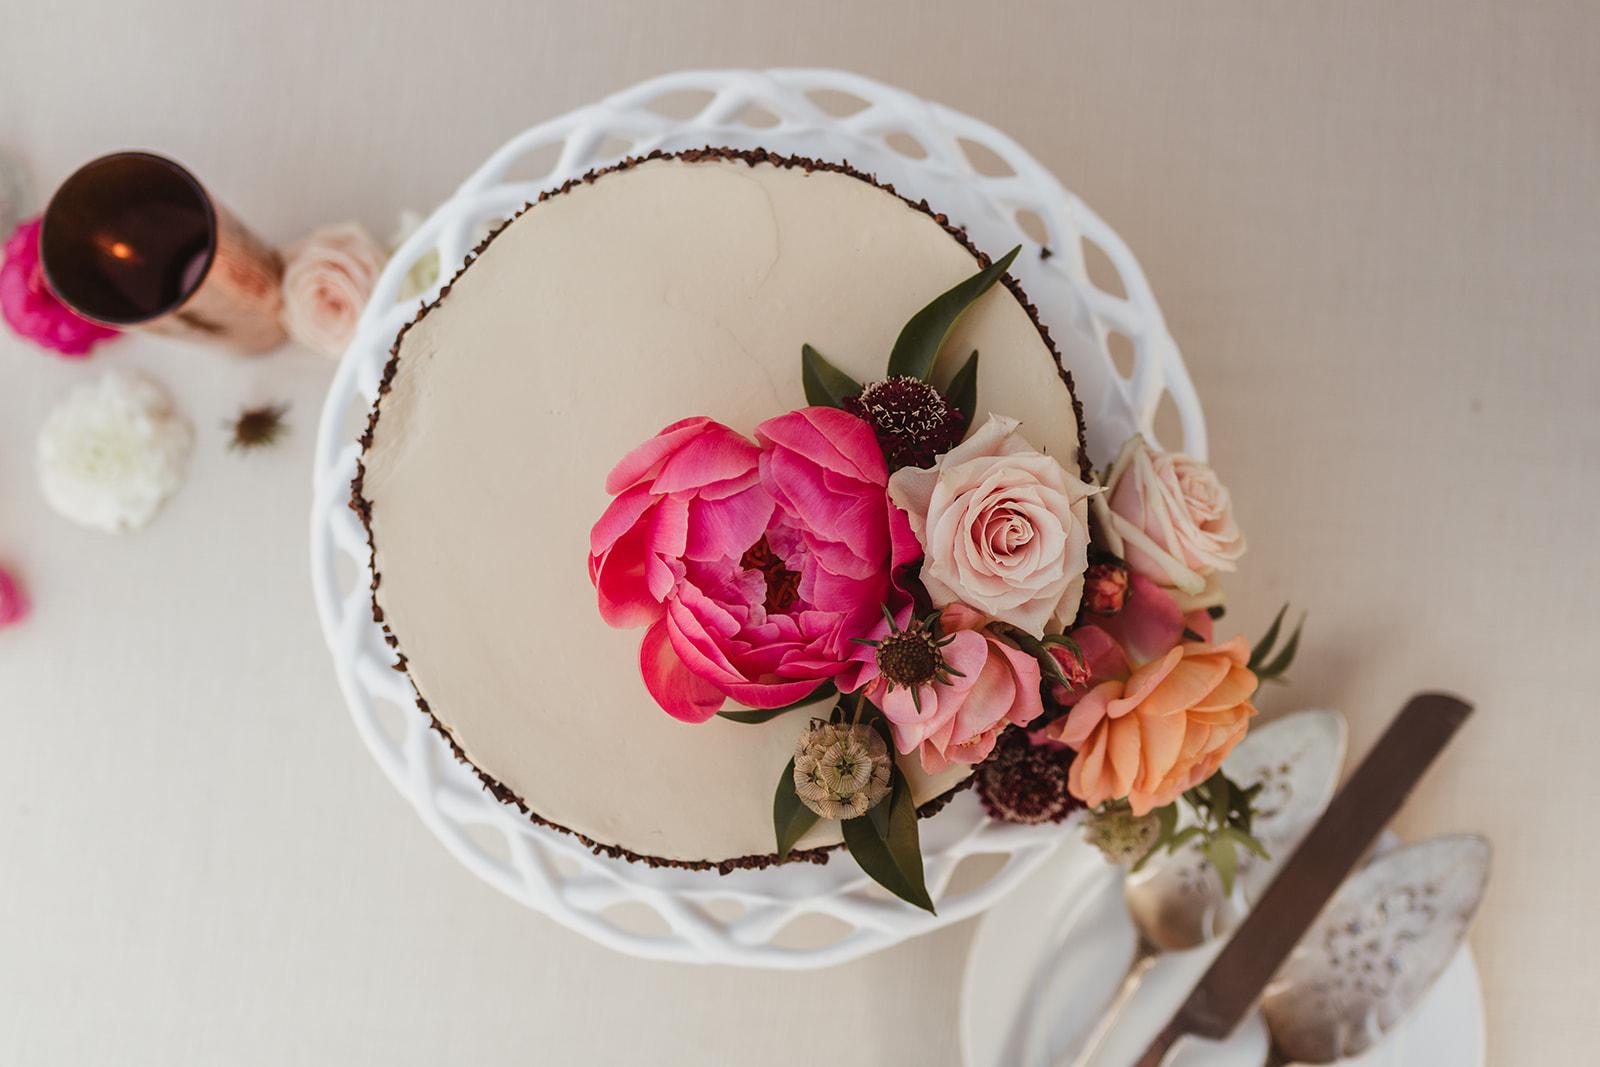 37 cake flowers.jpg